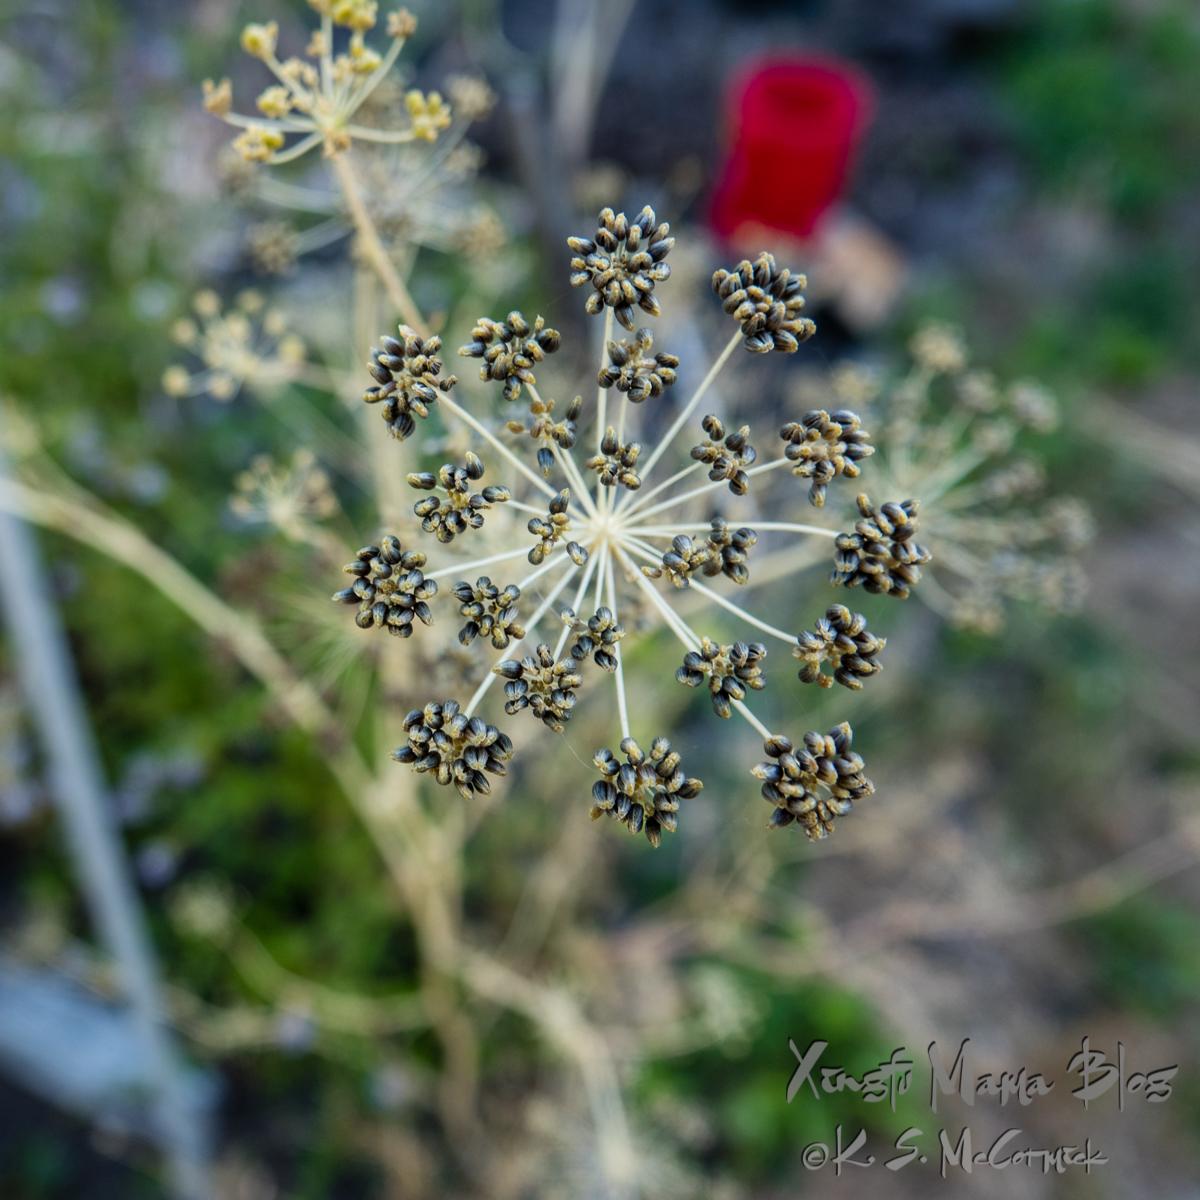 Parsley seed head look almost like a snowflake.